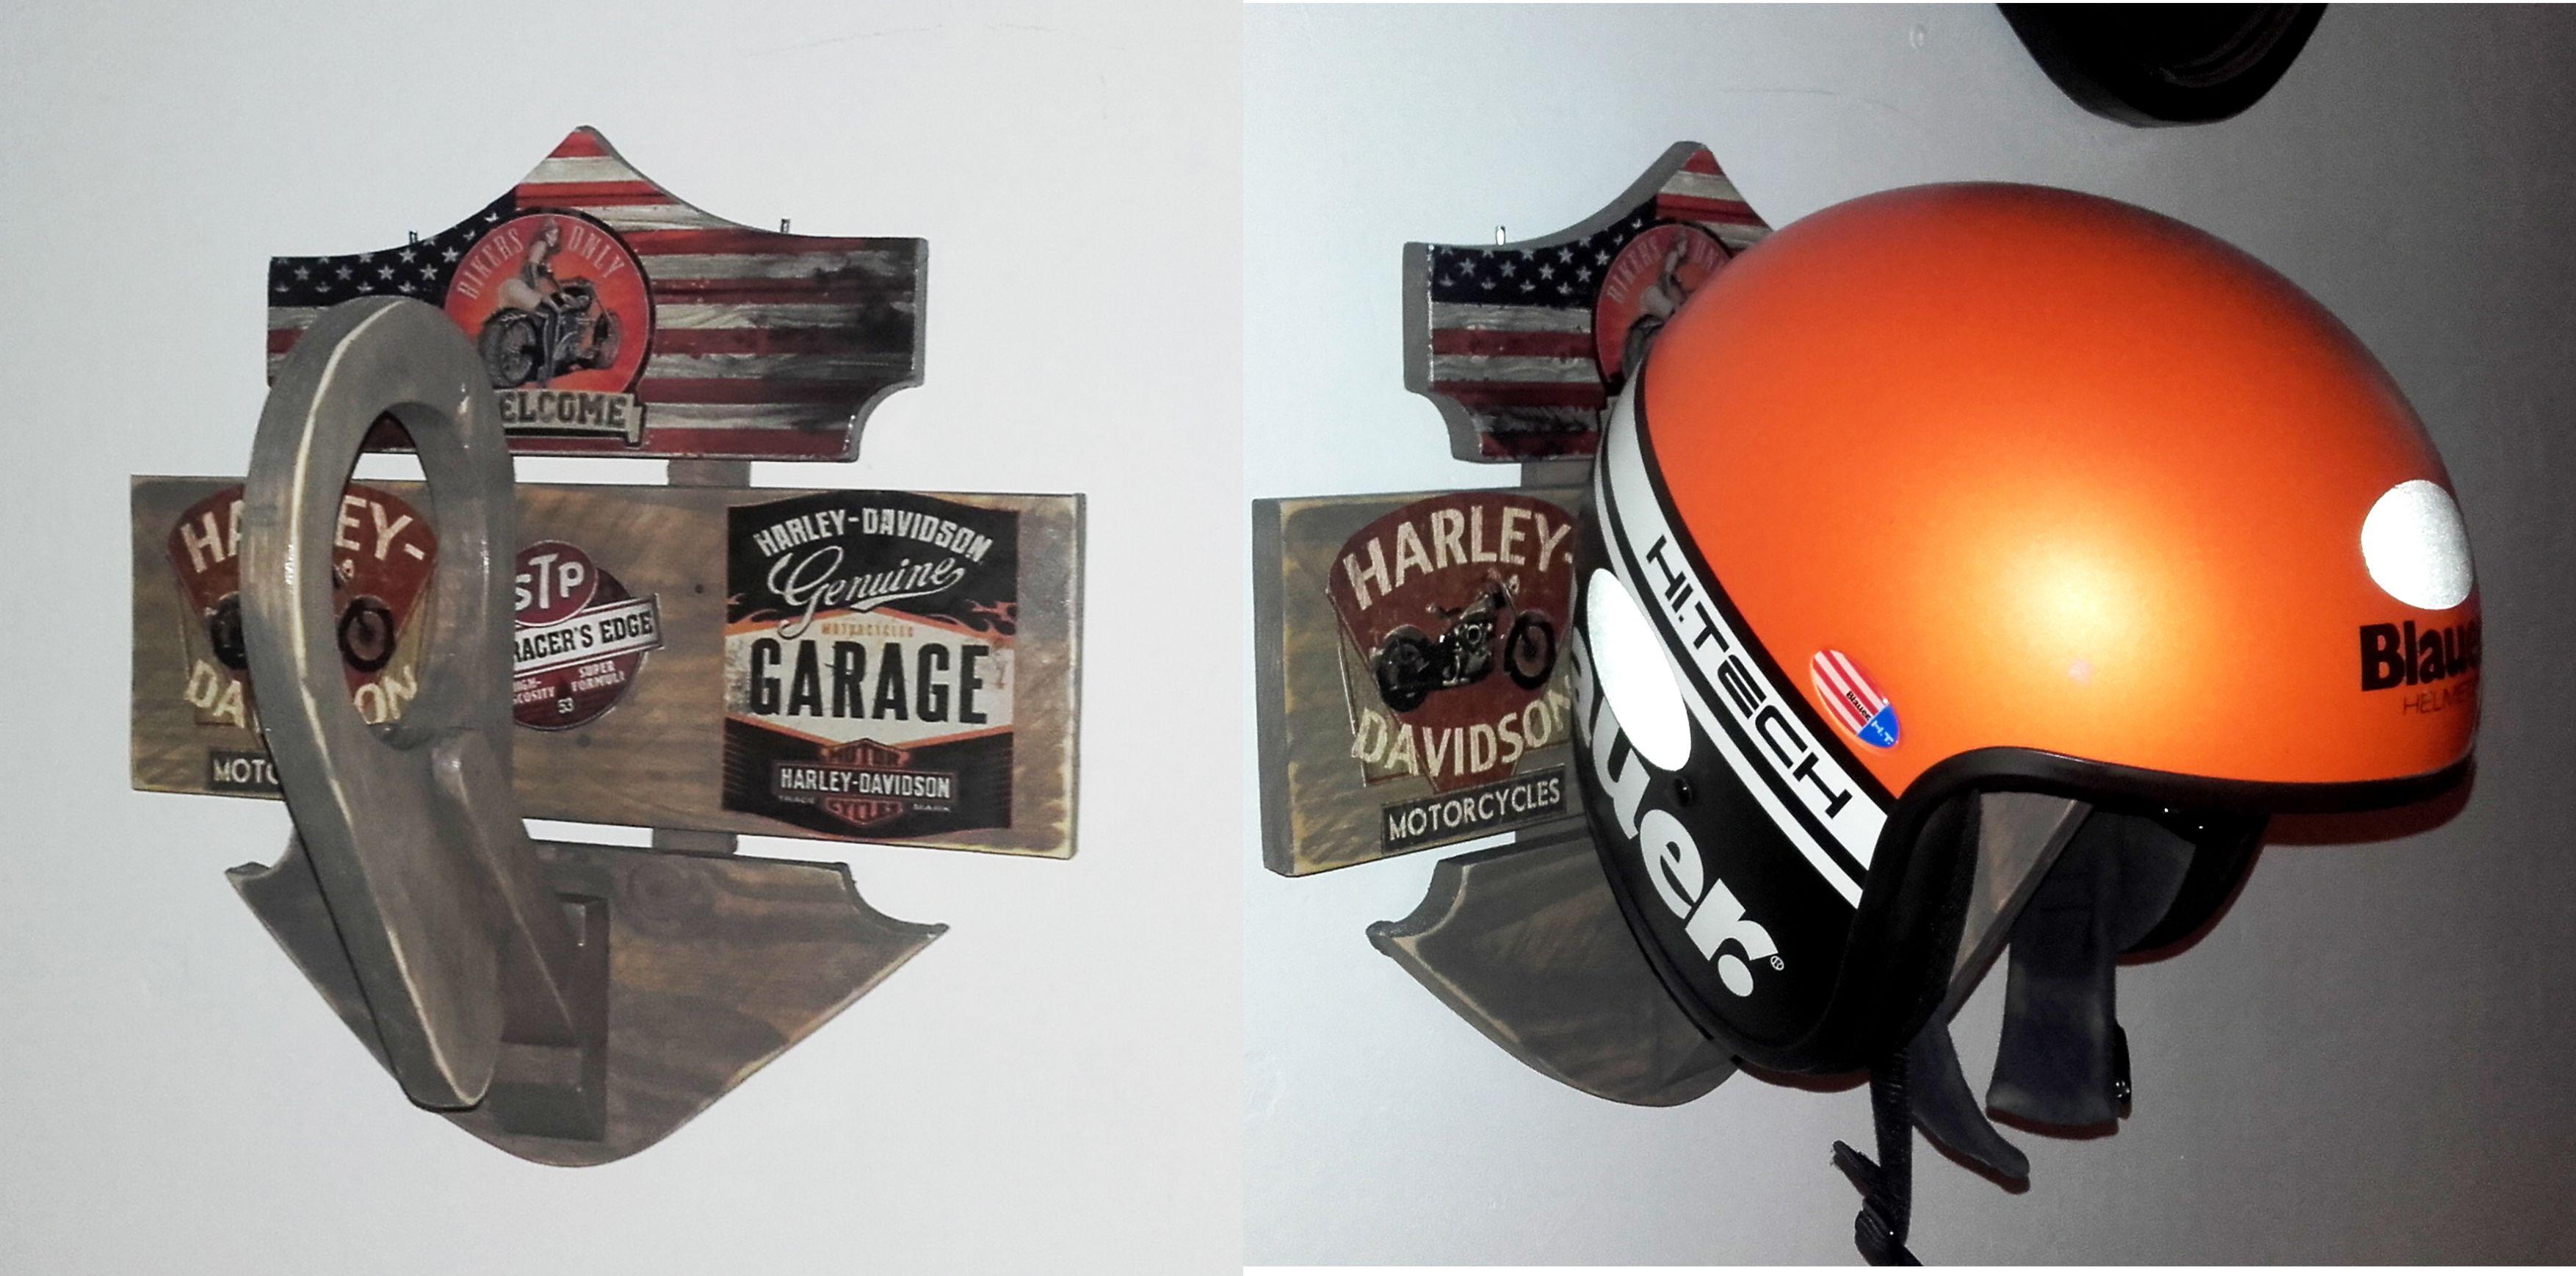 Diy Support De Casque Support De Casque Moto Support Mural Pour Casque Harley Davidson Accessoire Harley D Support Mural Harley Davidson Harely Davidson